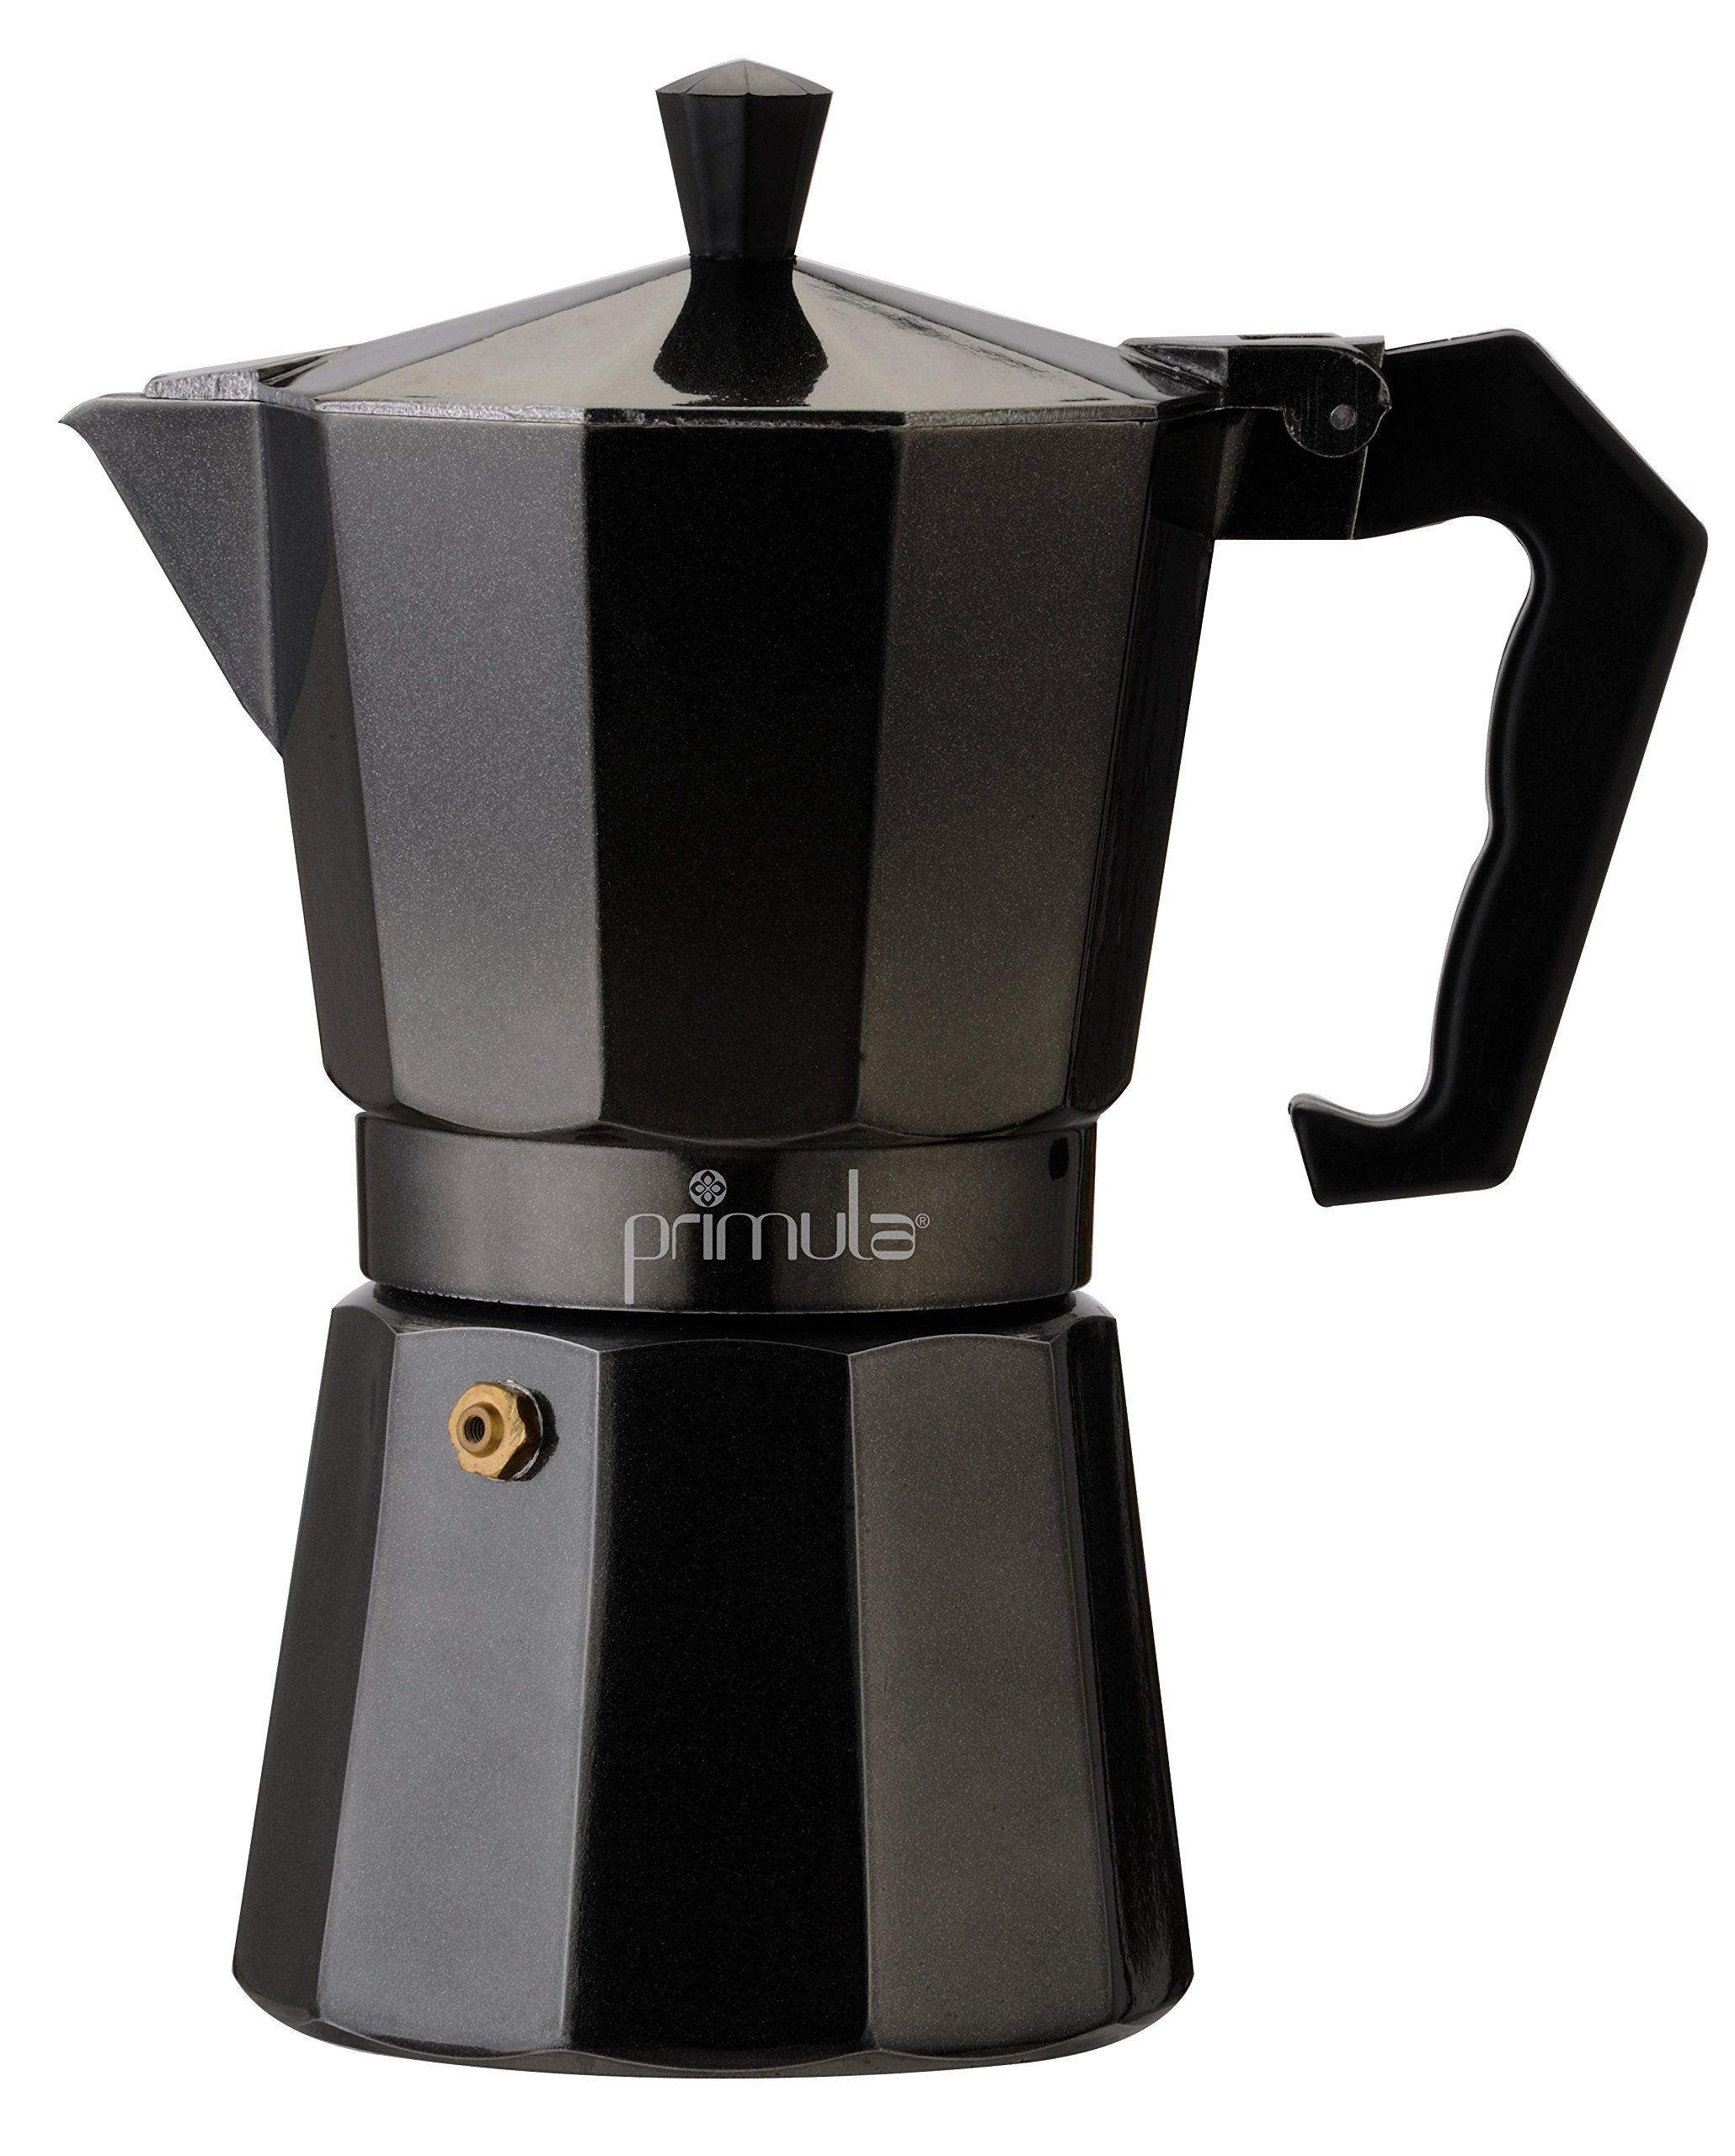 Primula PEBK-3306 6-Cup Aluminum Espresso Coffee Maker, Black